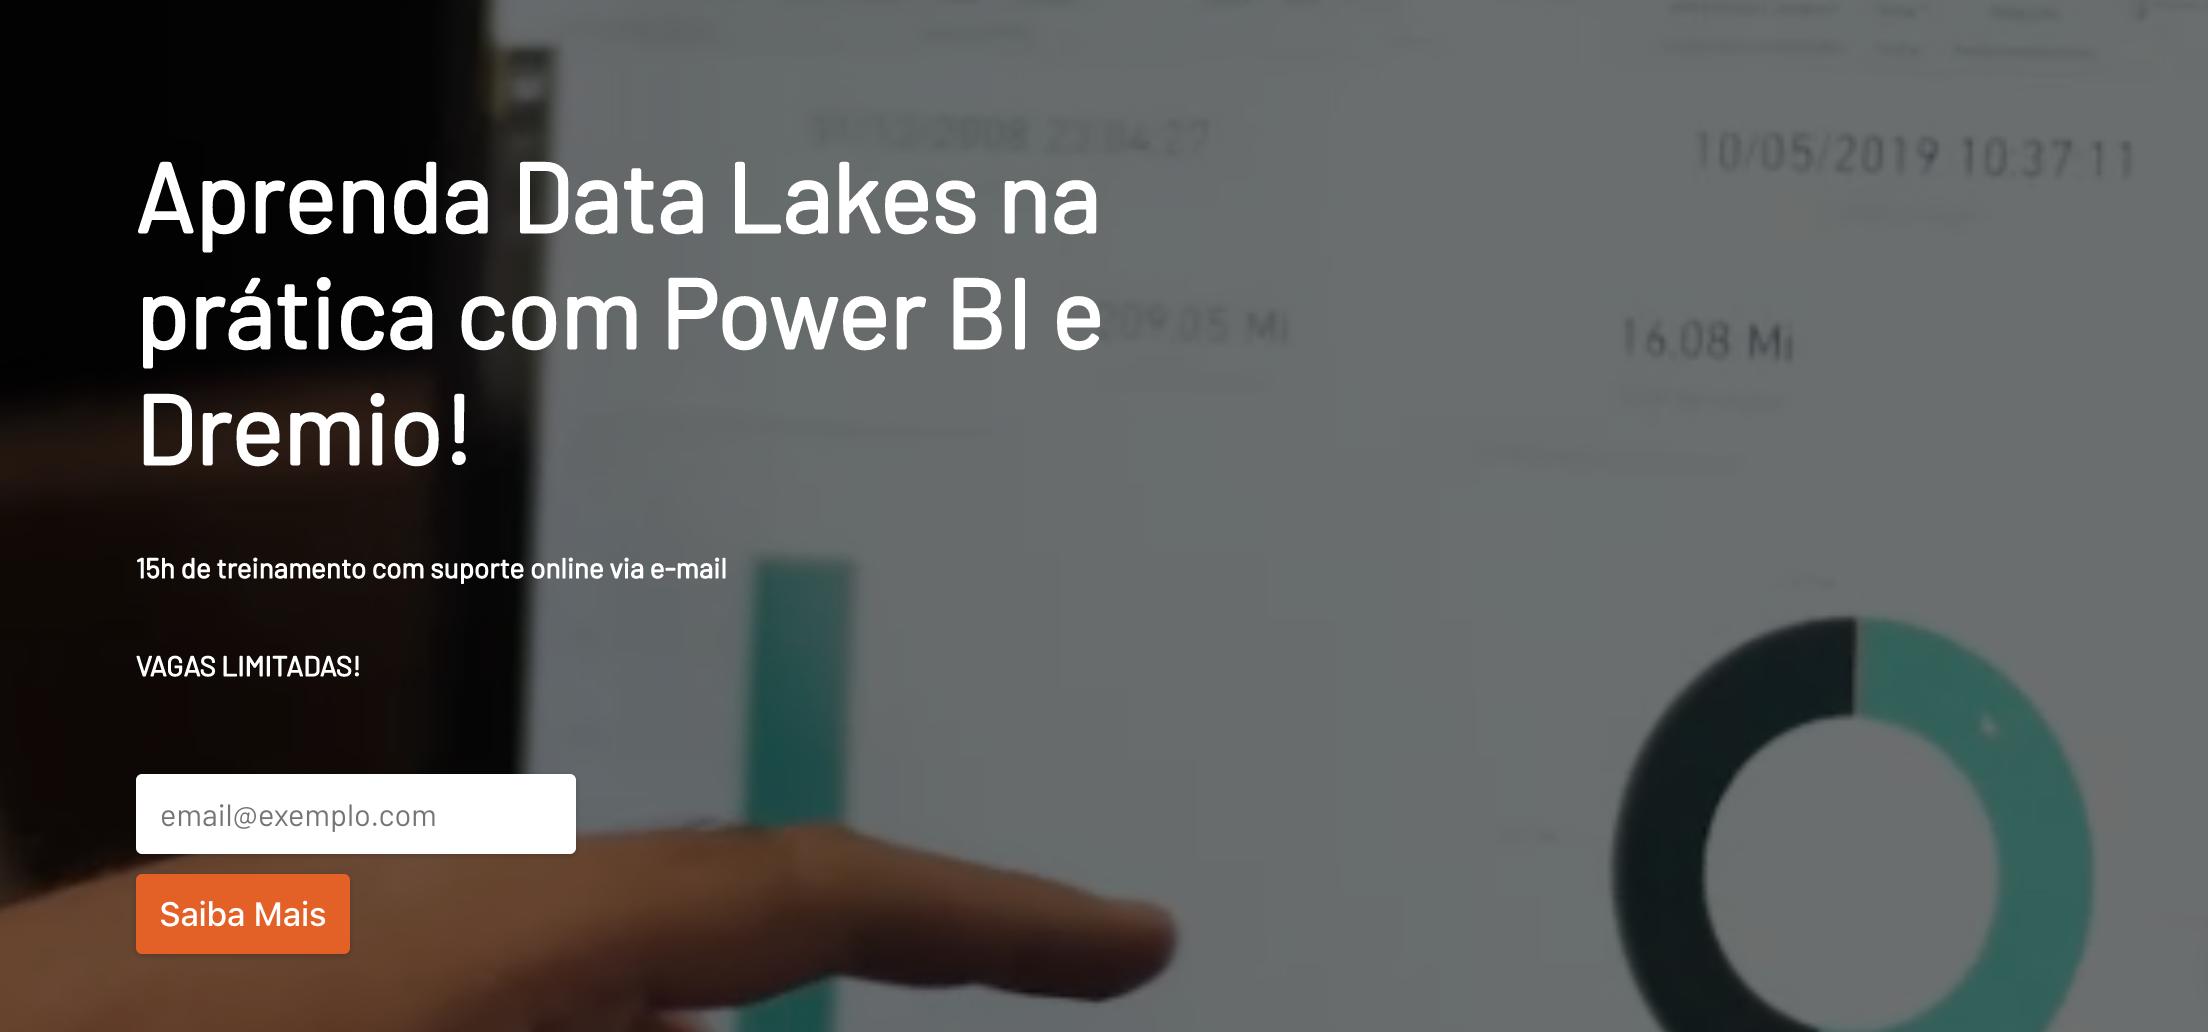 datalakes datasprints